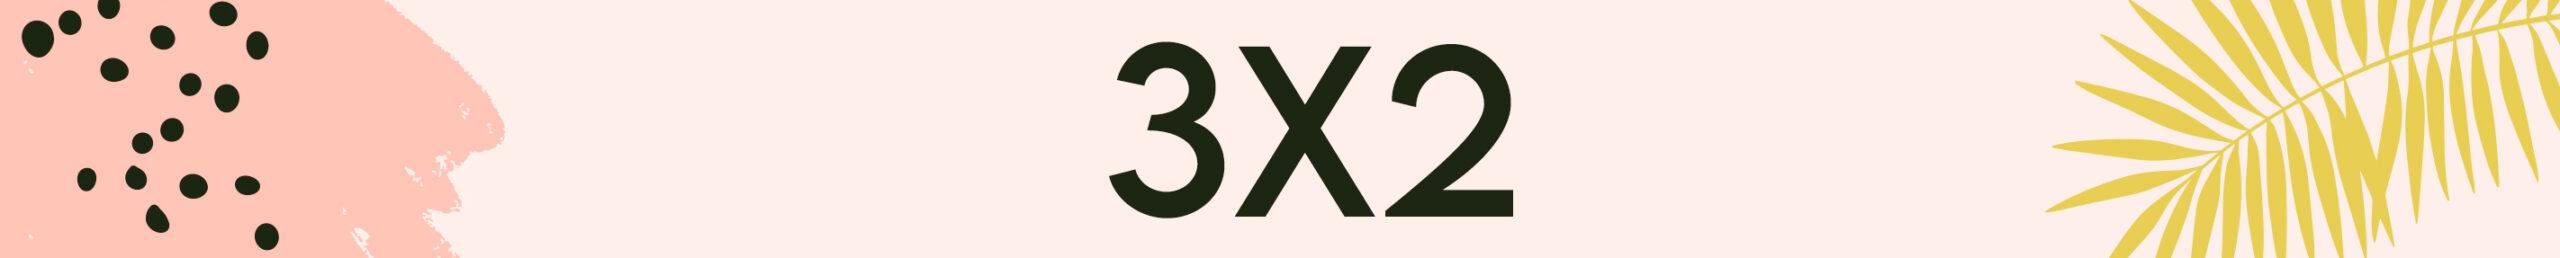 3X2-mascarillas2